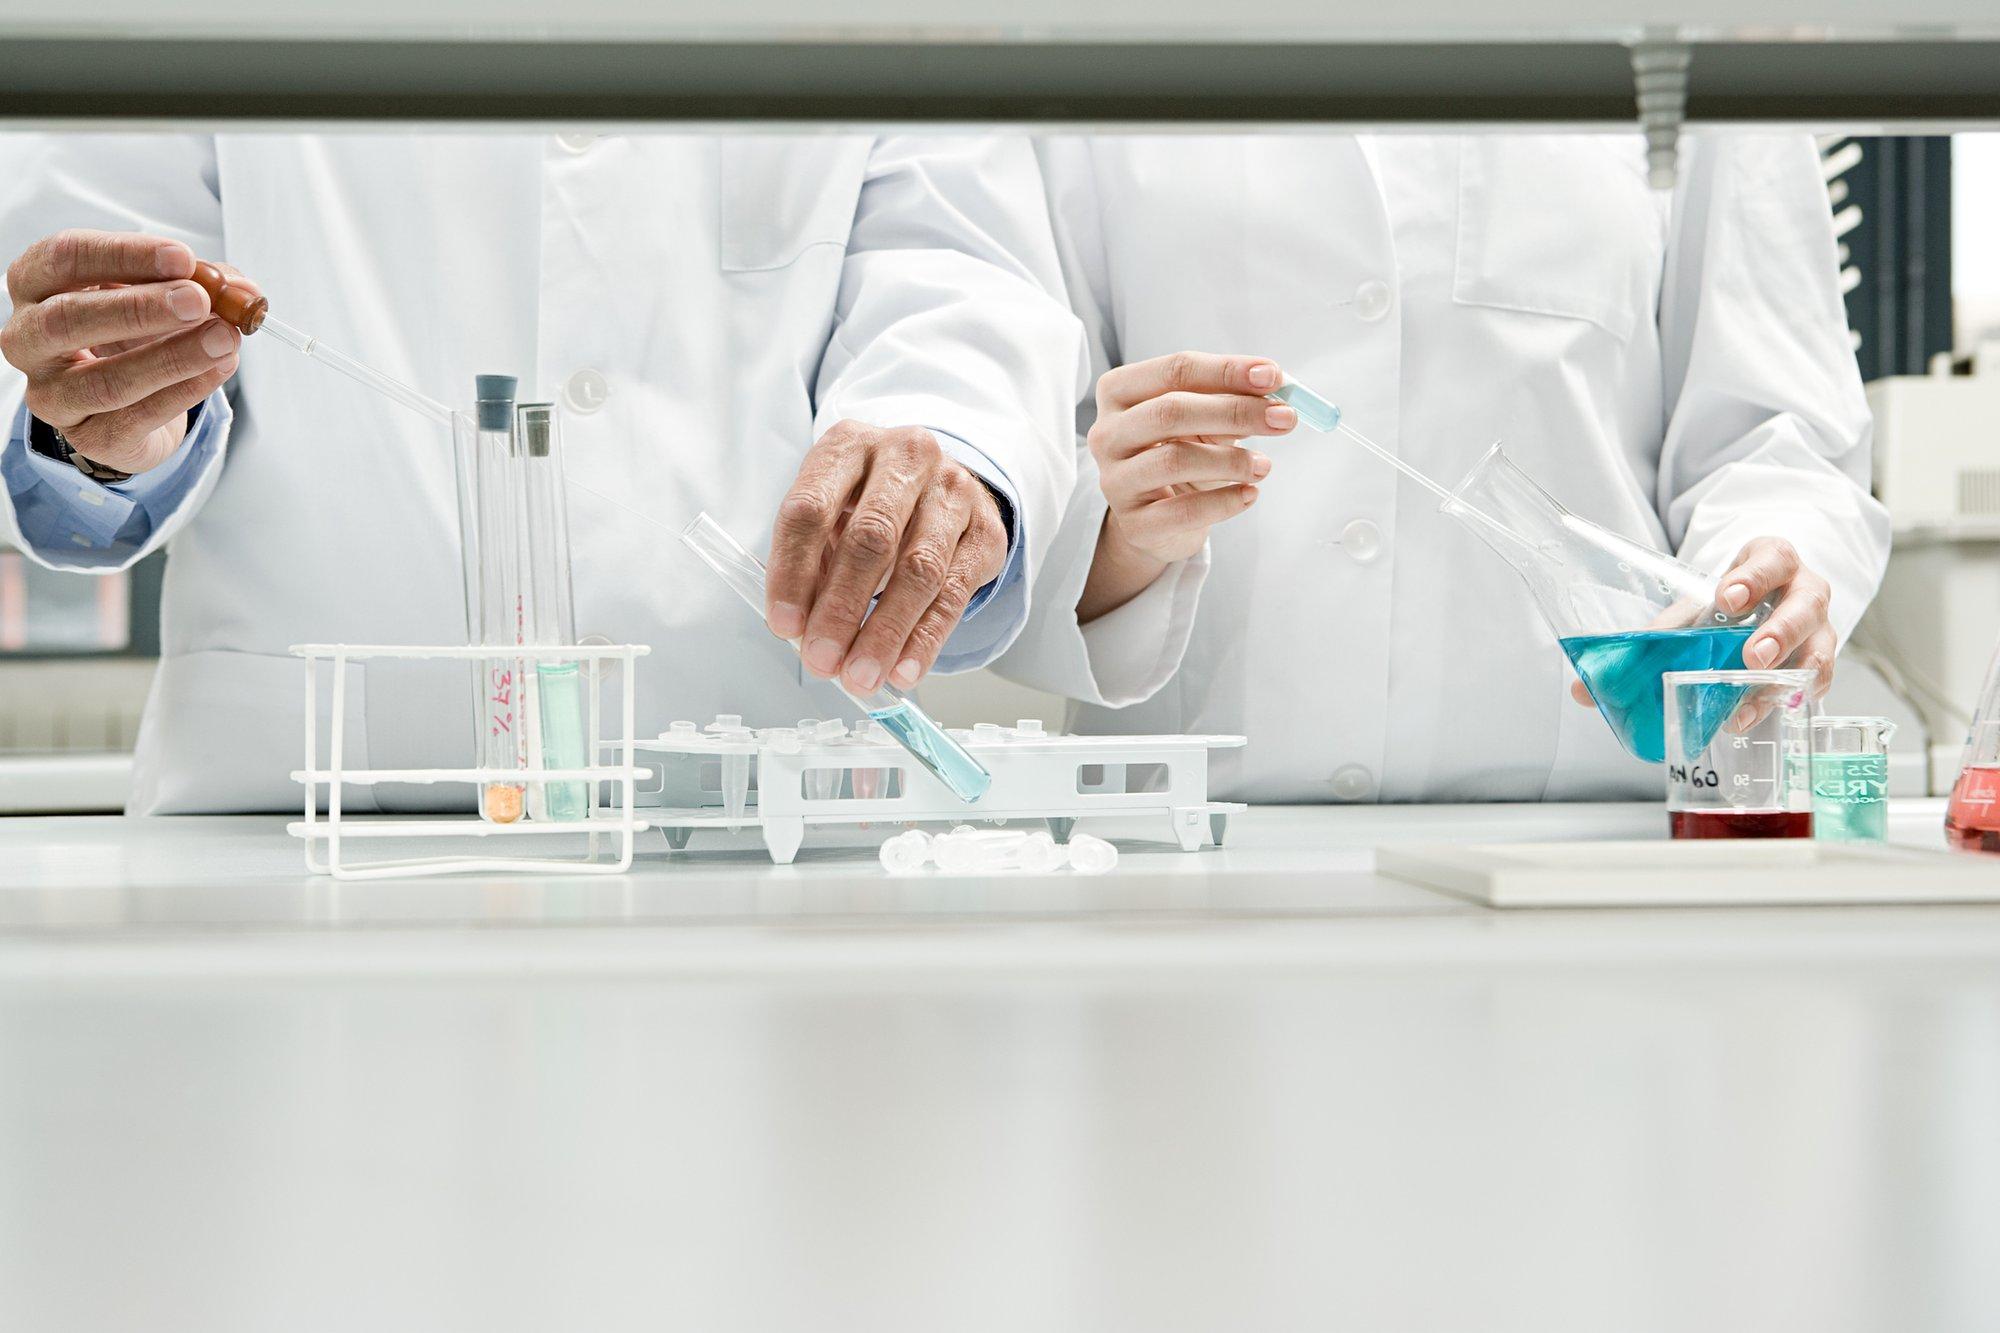 Clovis Oncology (CLVS) Stock Flies Despite Lacklustre Earnings